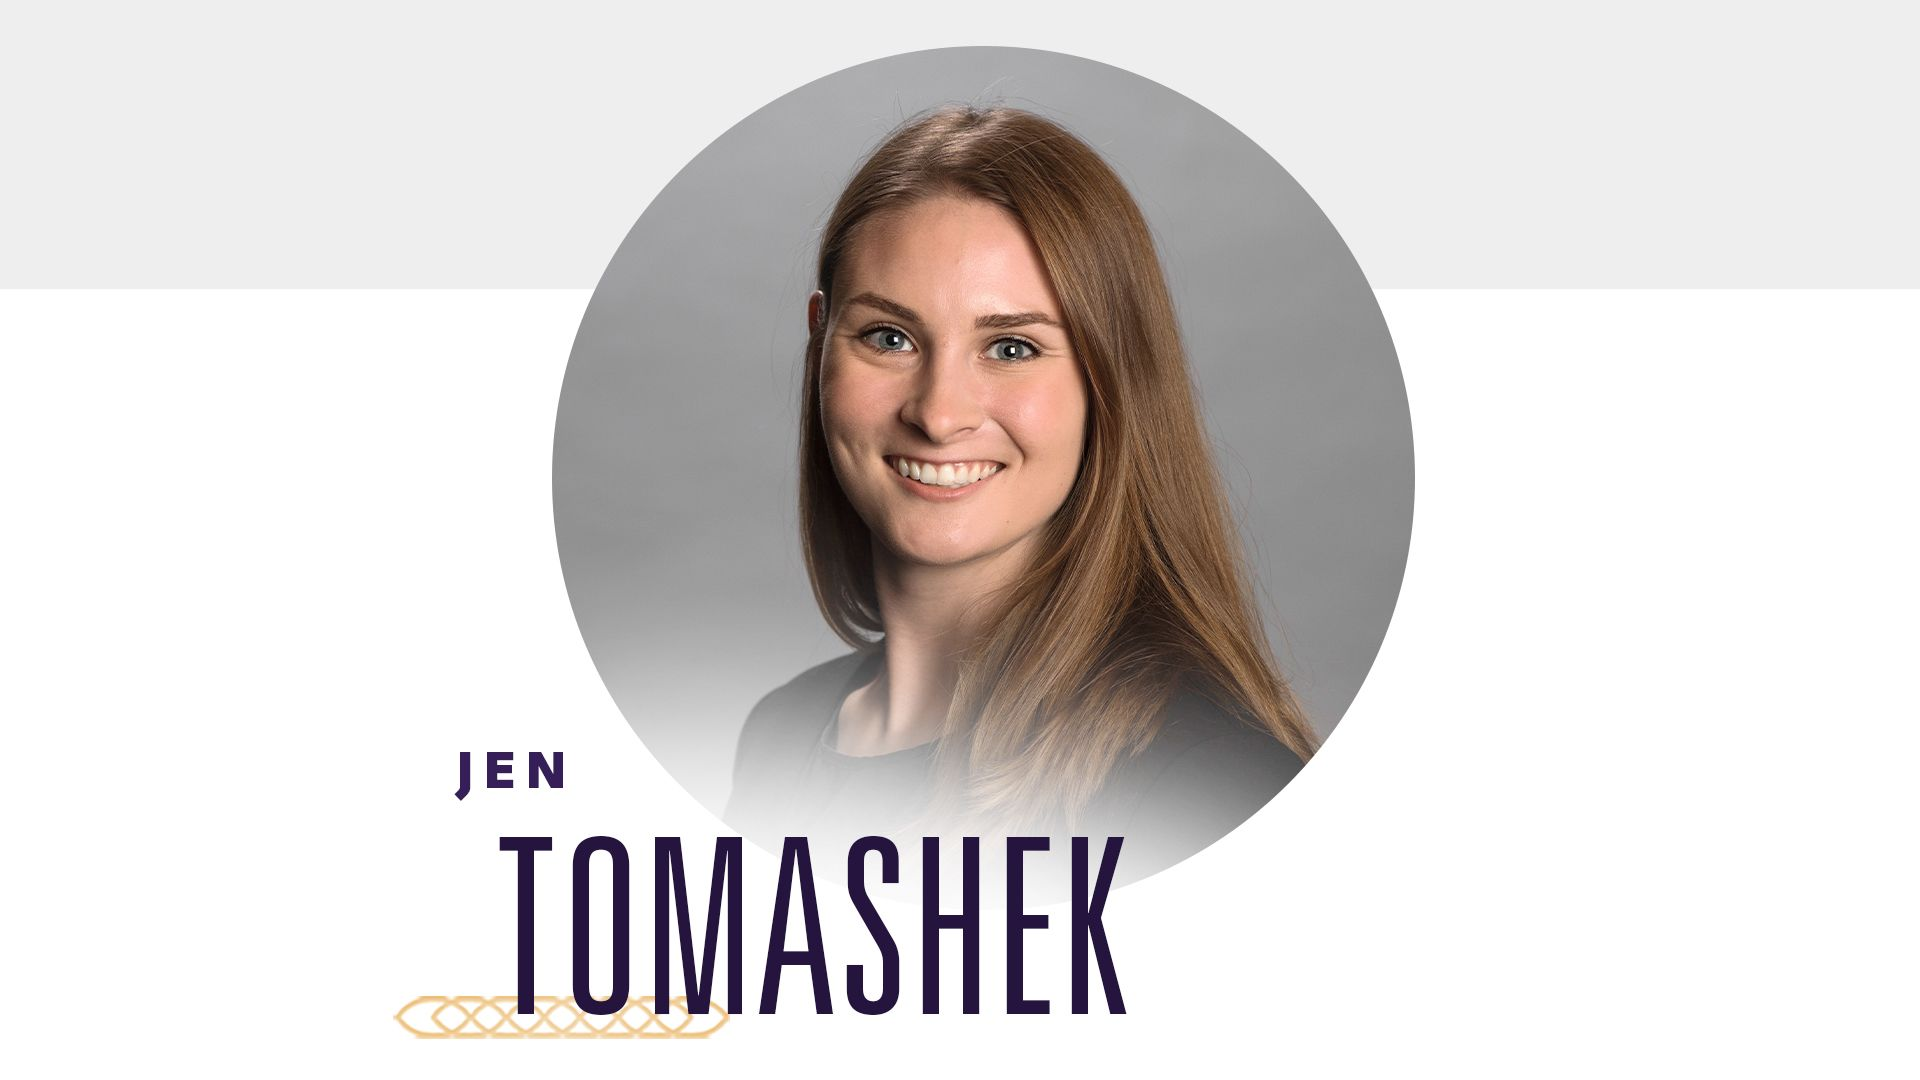 Jen Tomashek, Sales Analytics and Engagement Specialist, Minnesota Vikings